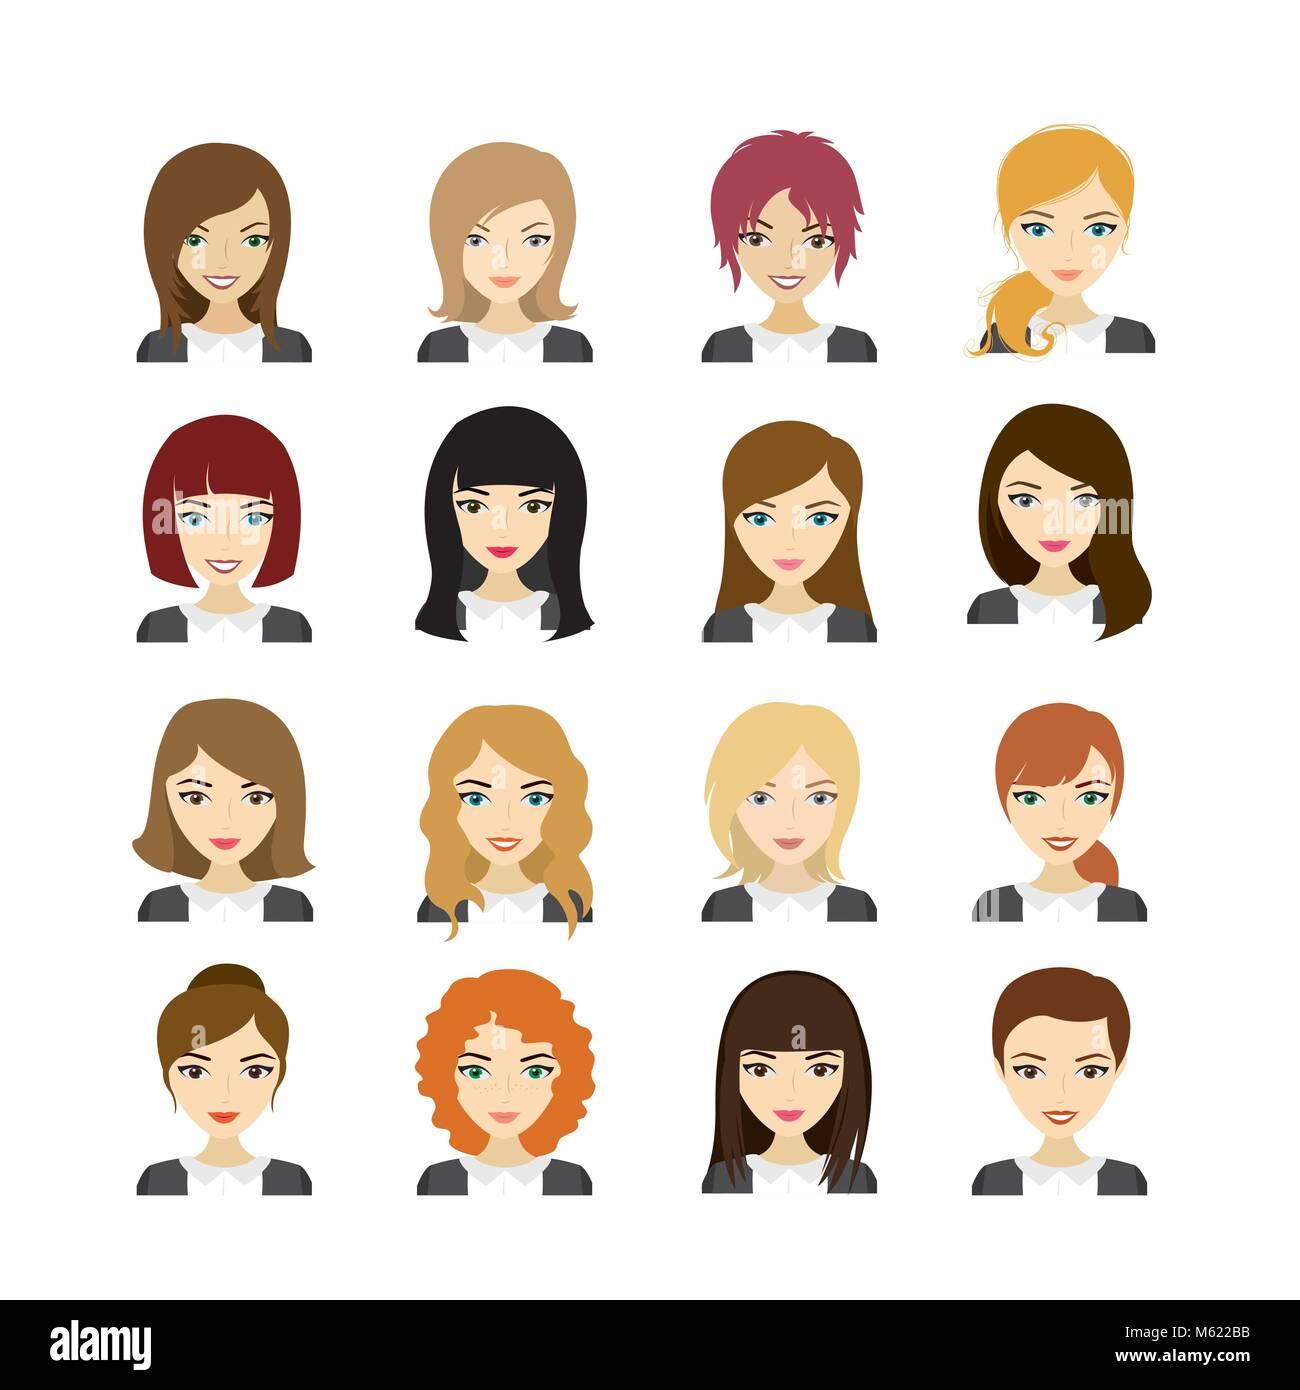 hairstyles vector vectors stock photos hairstyles vector vectors